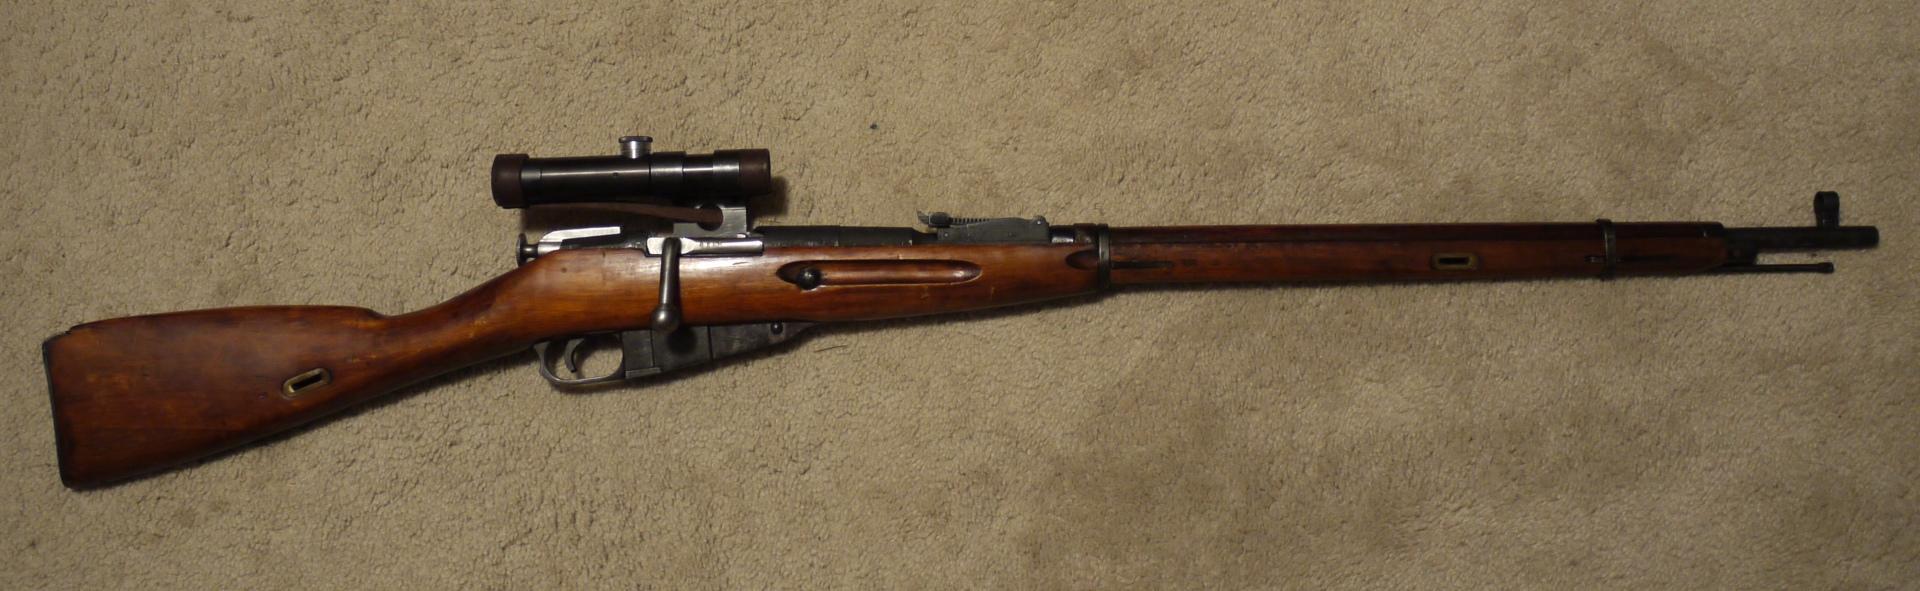 Mosin Nagant Rifle wallpapers HD quality